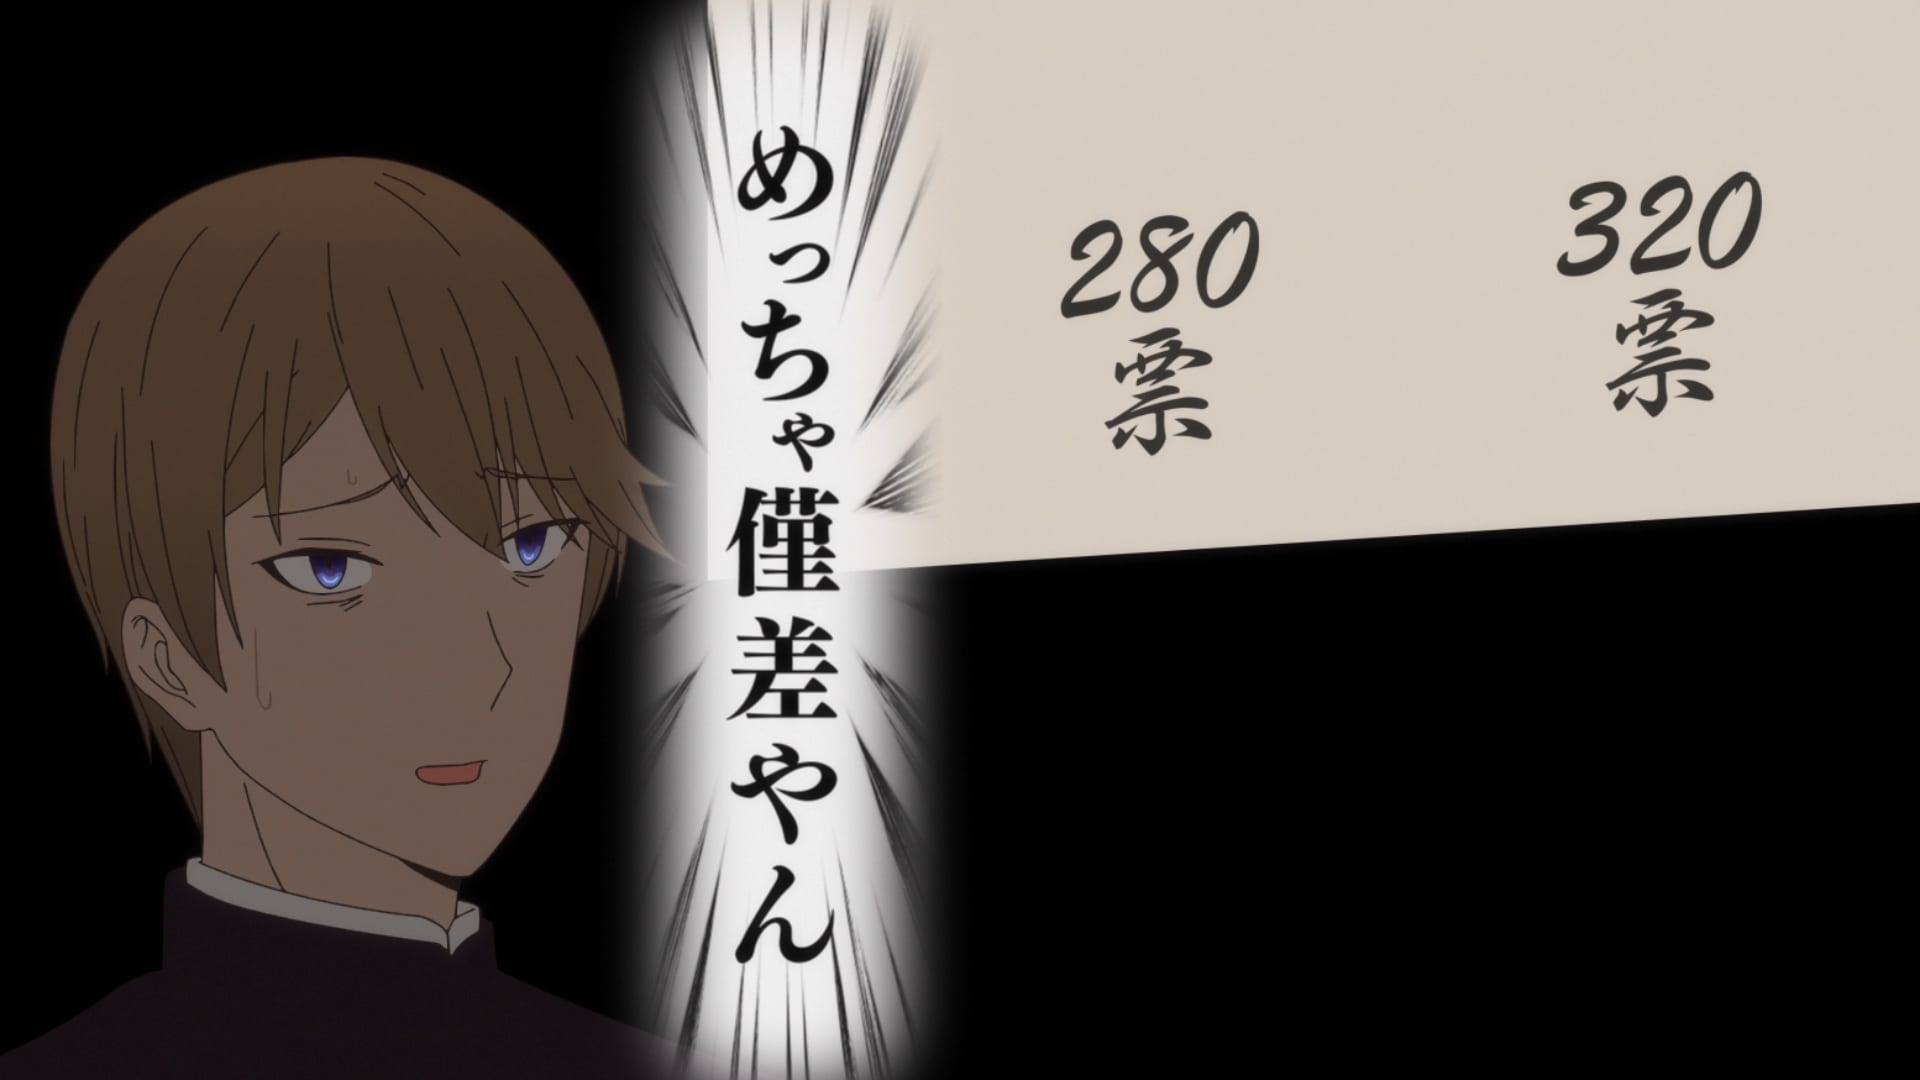 Miyuki Shirogane wins the elections